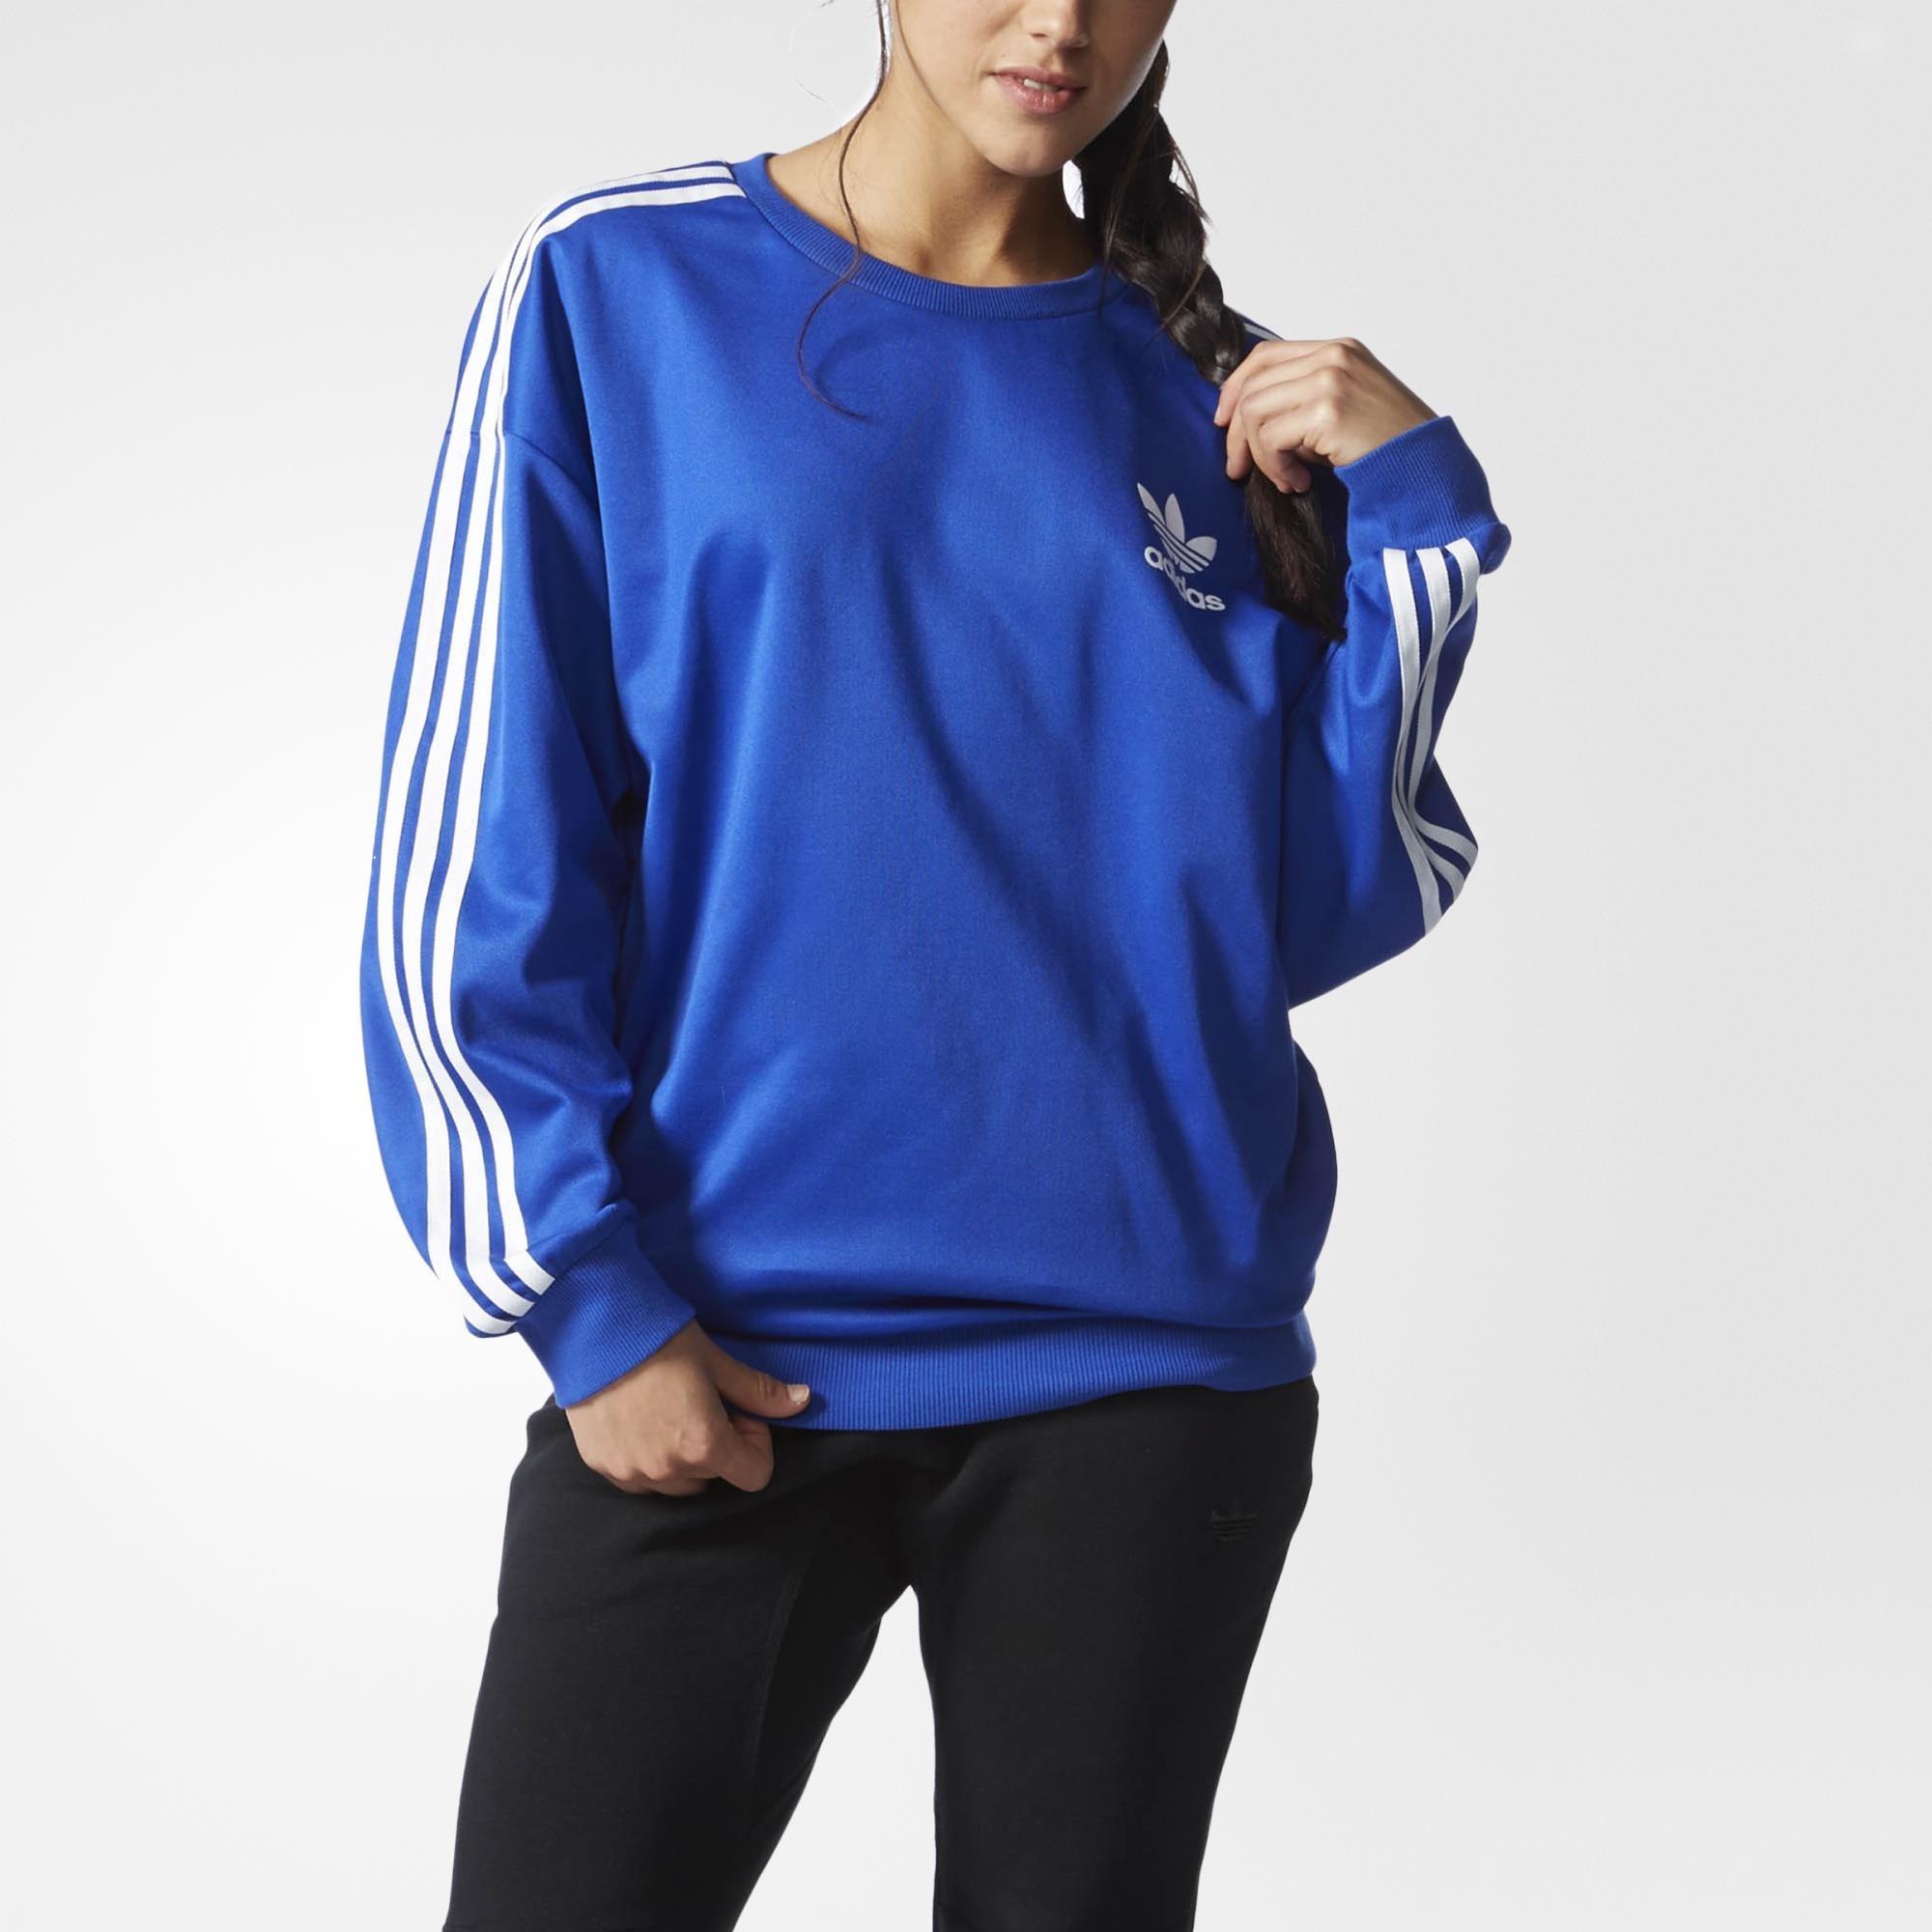 Adidas Sweatshirt Sweatshirt Blue Beckenbauer Adidas Blue Beckenbauer Uk Uk ag74q